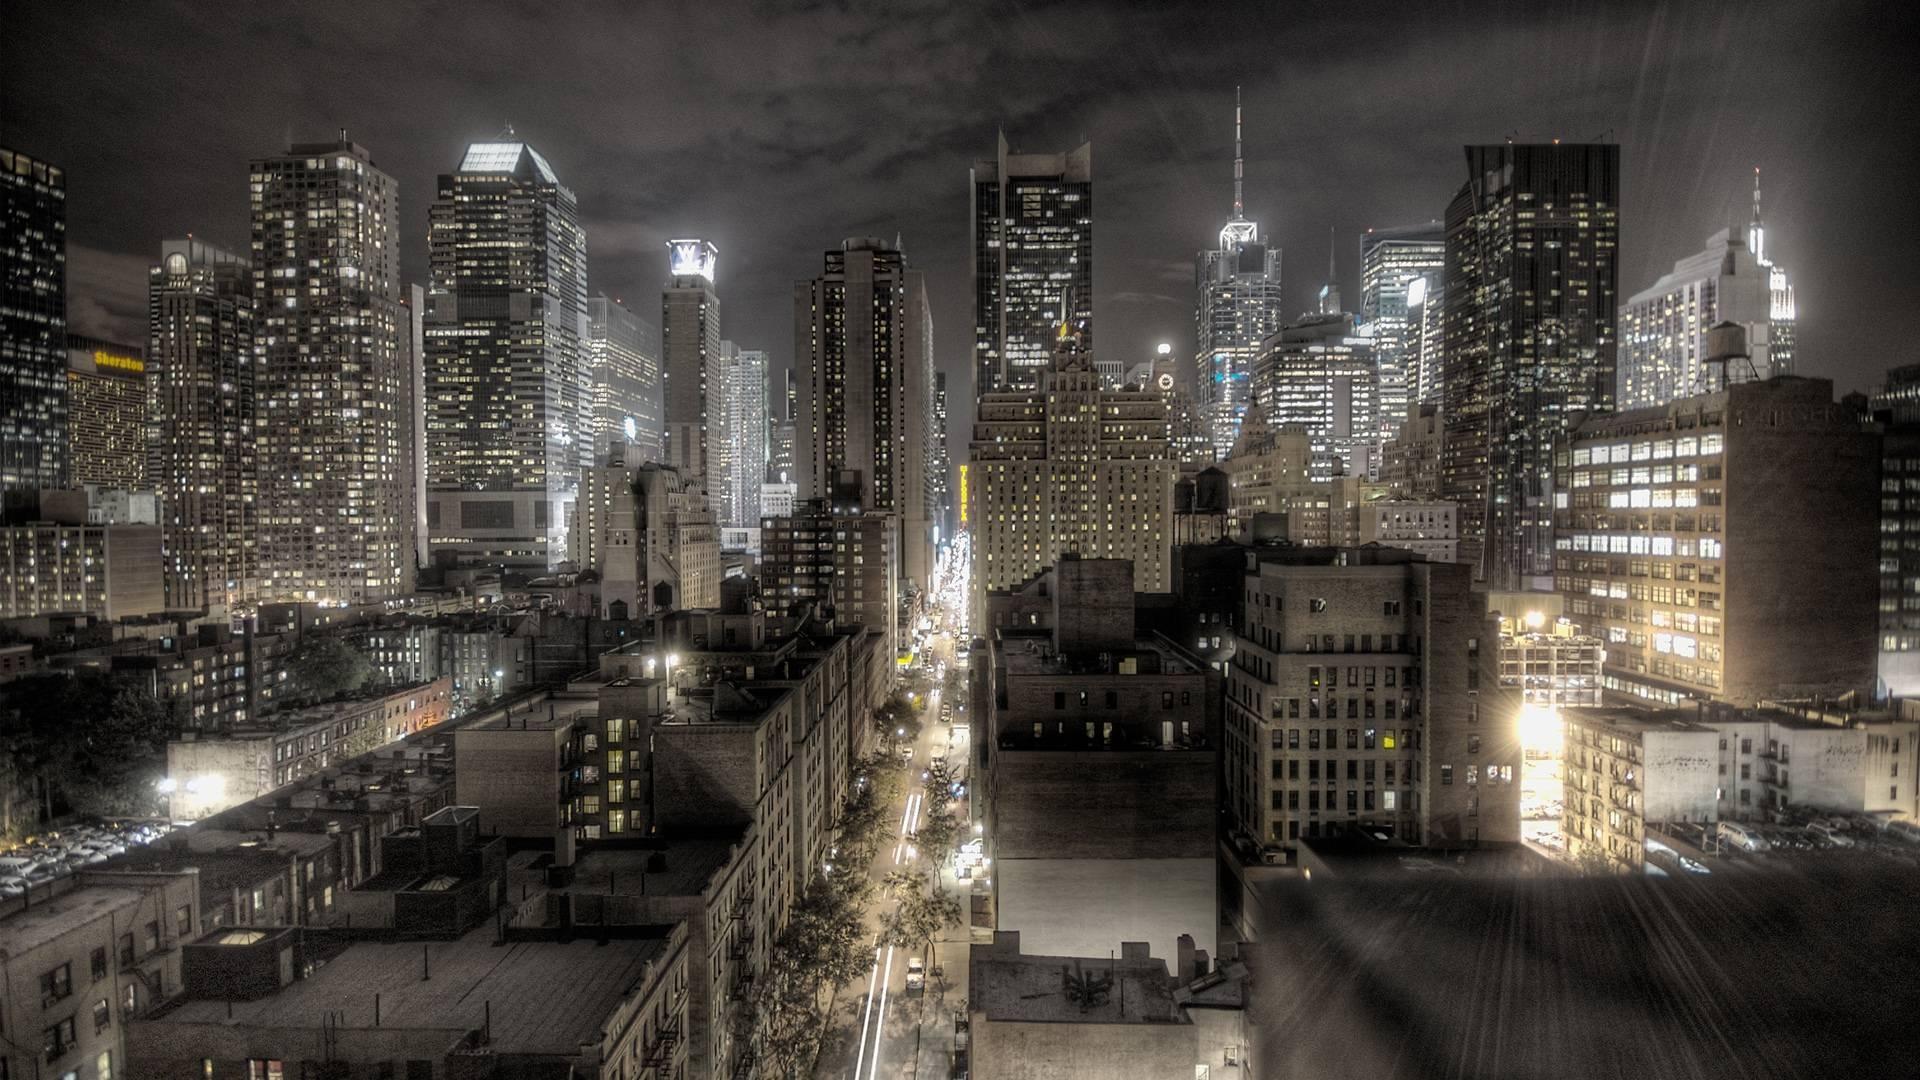 New York city HDR image hd resolution free desktop background .